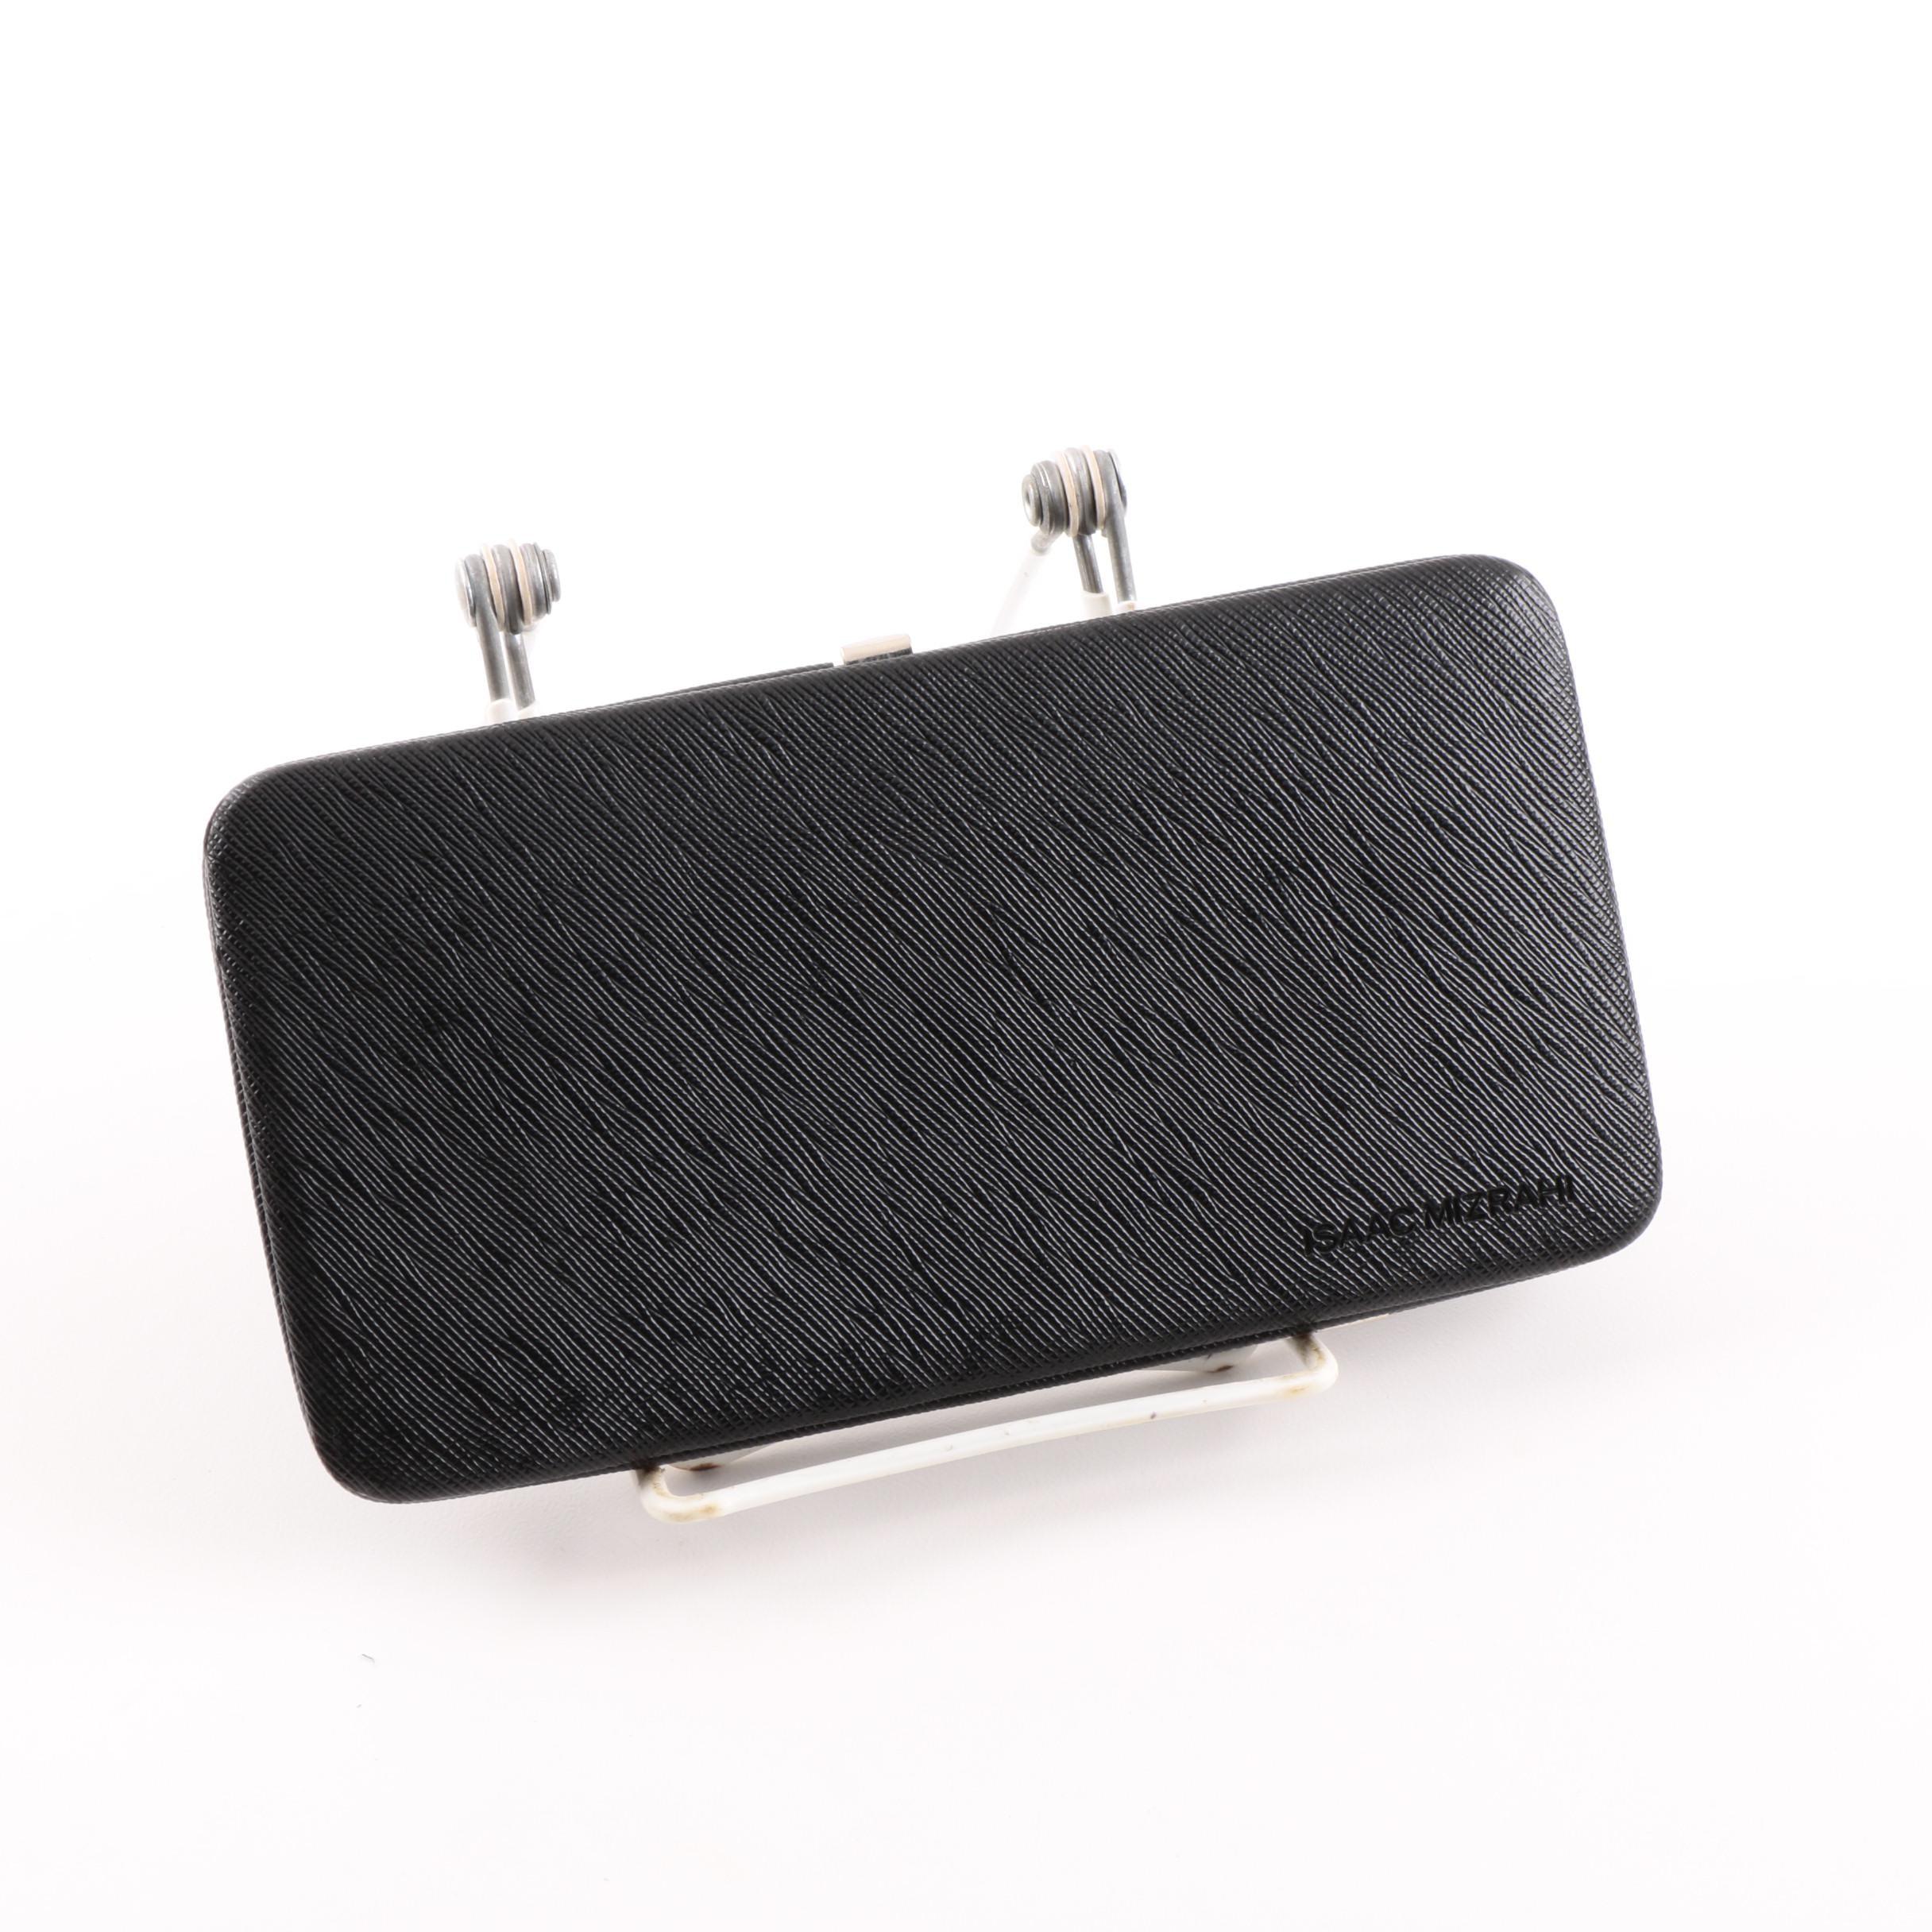 Isaac Mizrahi Black Faux Leather Wallet